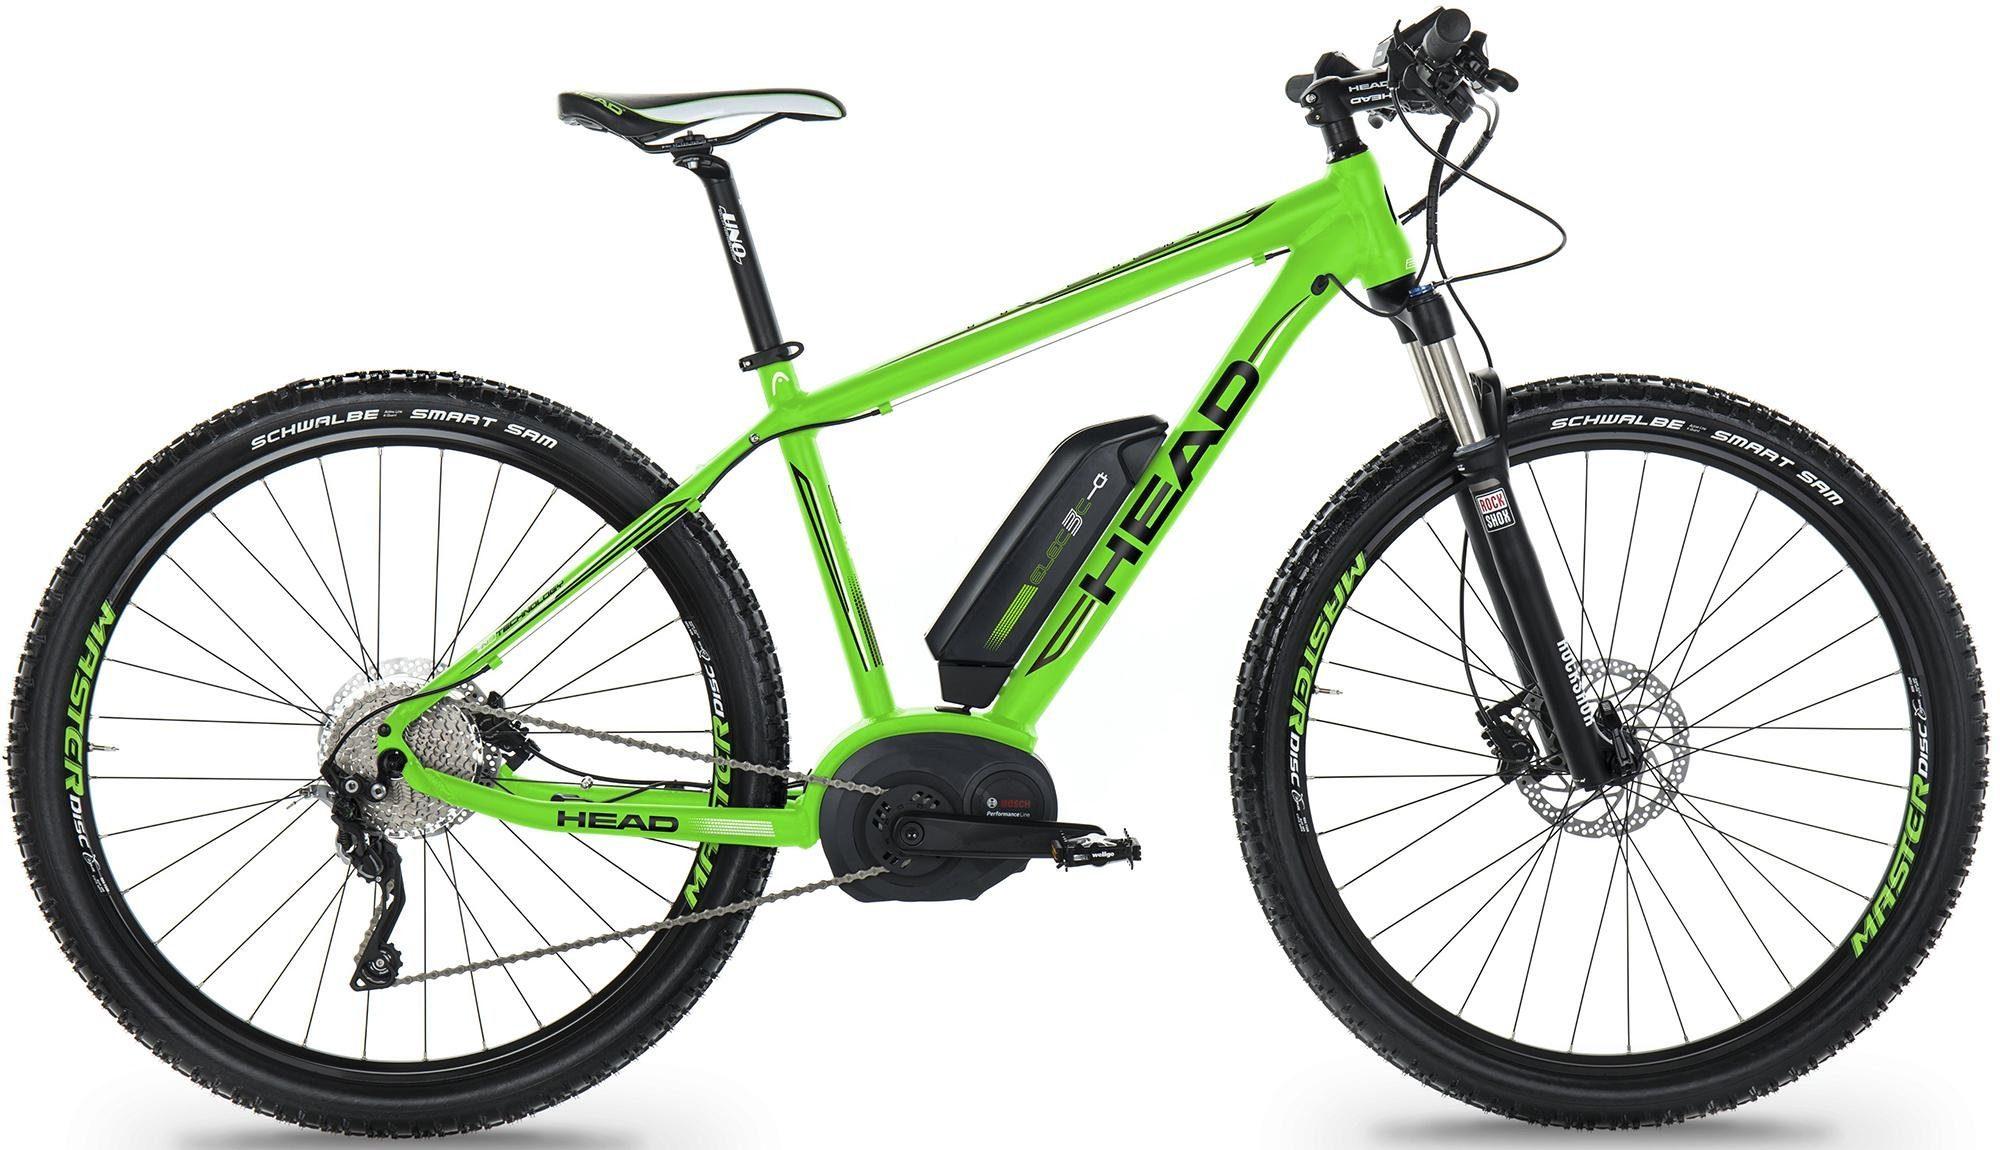 Head E-Bike Mountainbike, 29 Zoll, 10-Gang Shimano Kettenschaltung, »Preston«